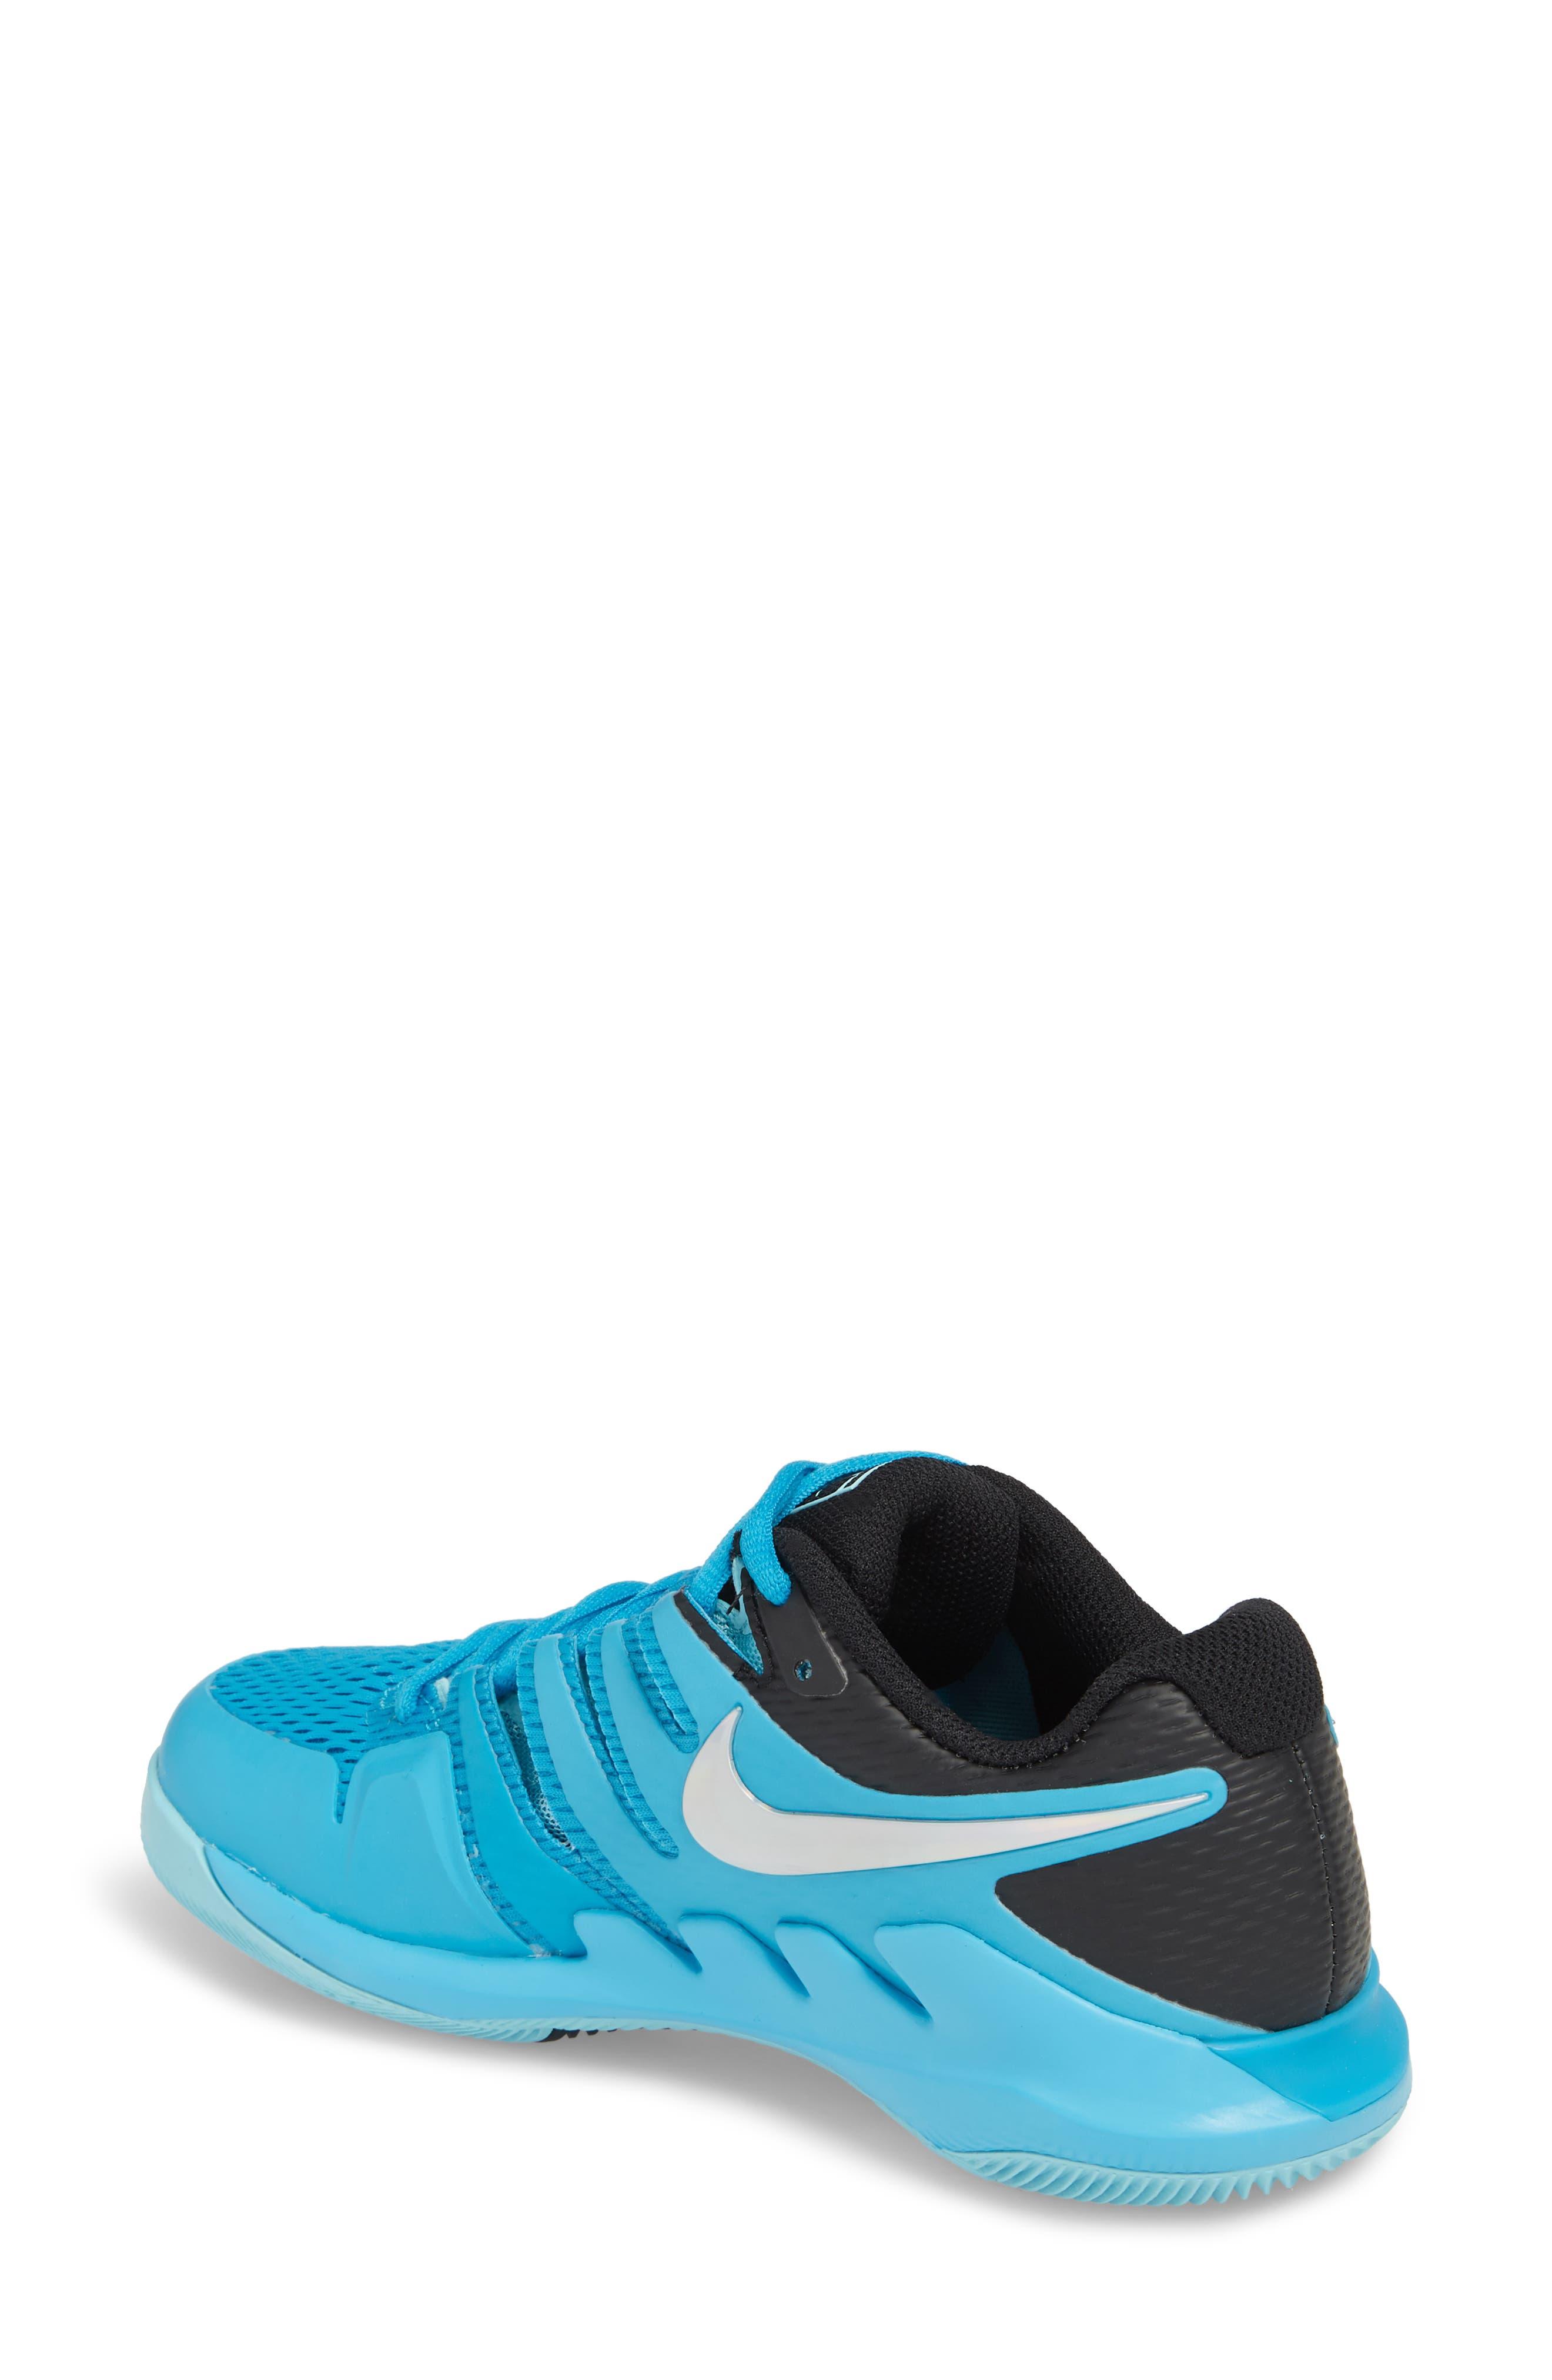 Air Zoom Vapor X Tennis Shoe,                             Alternate thumbnail 2, color,                             Light Blue Fury